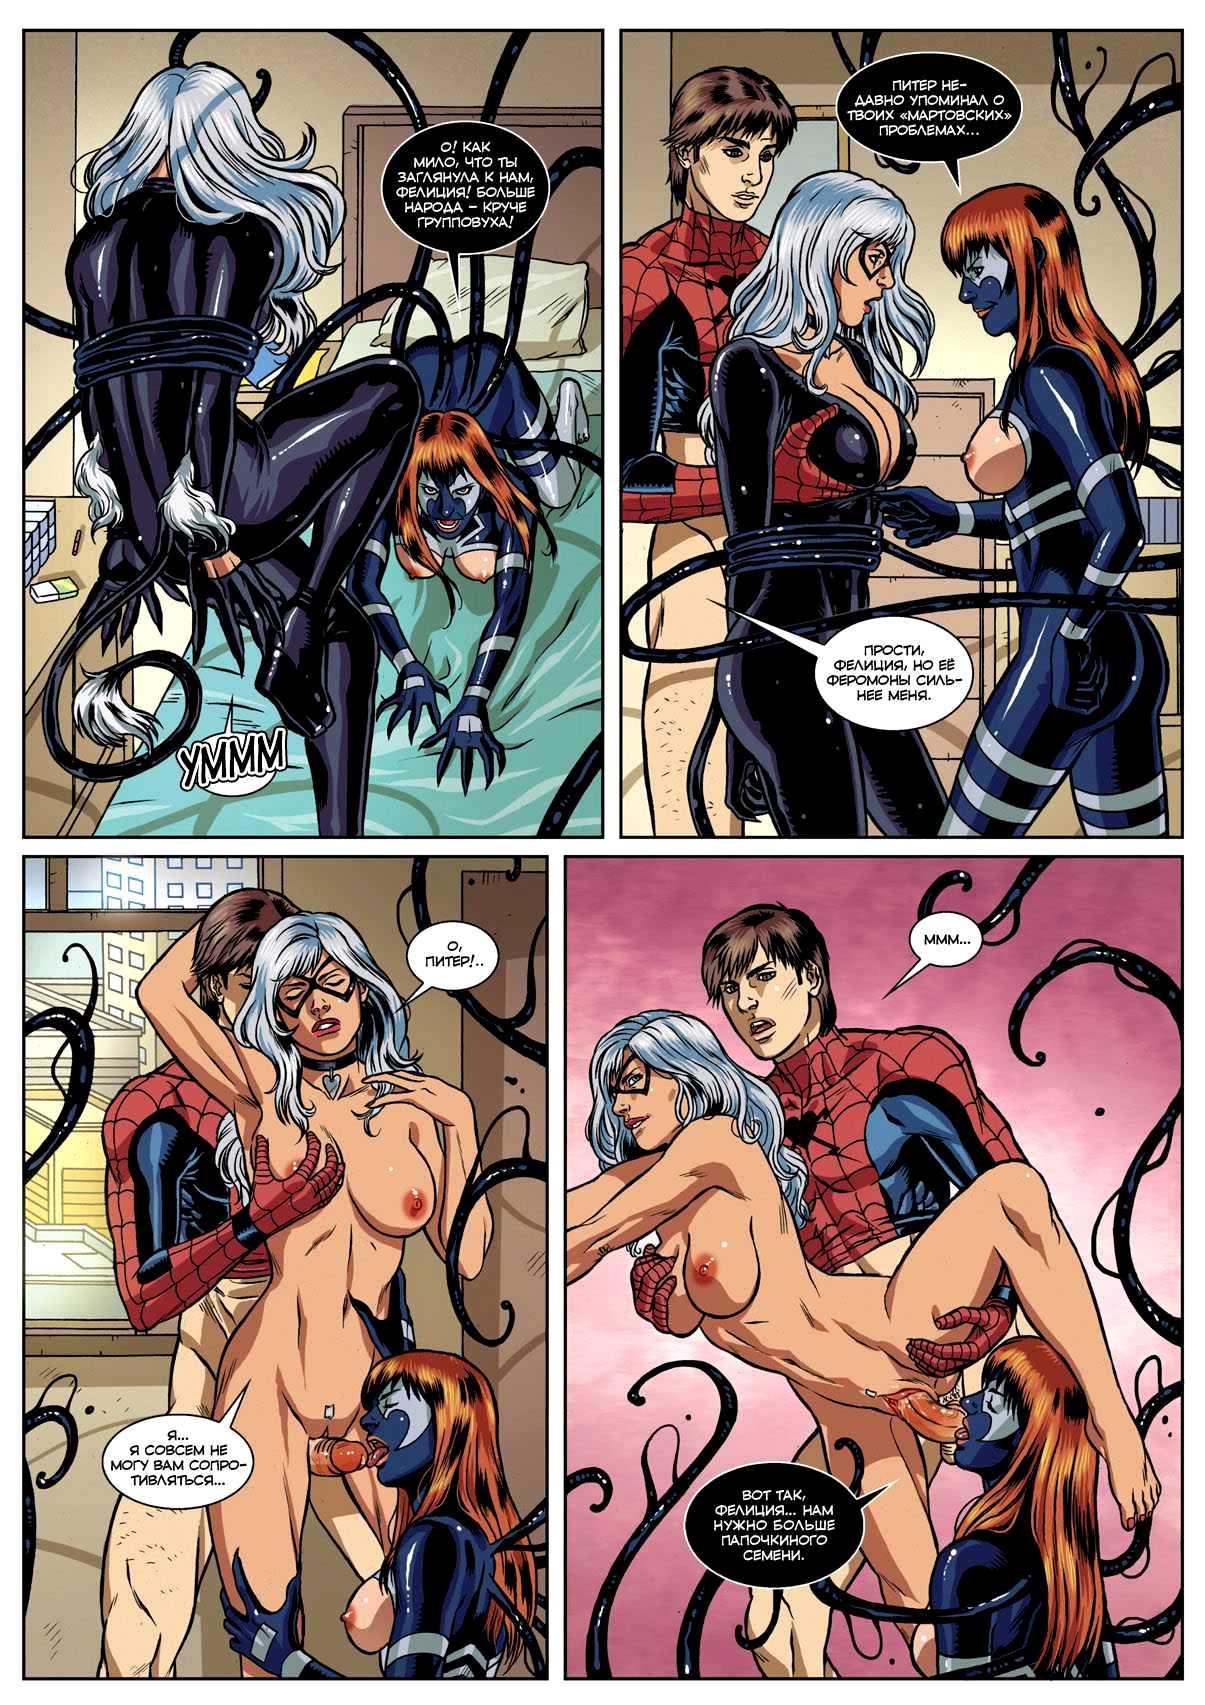 striptis porno comics porno